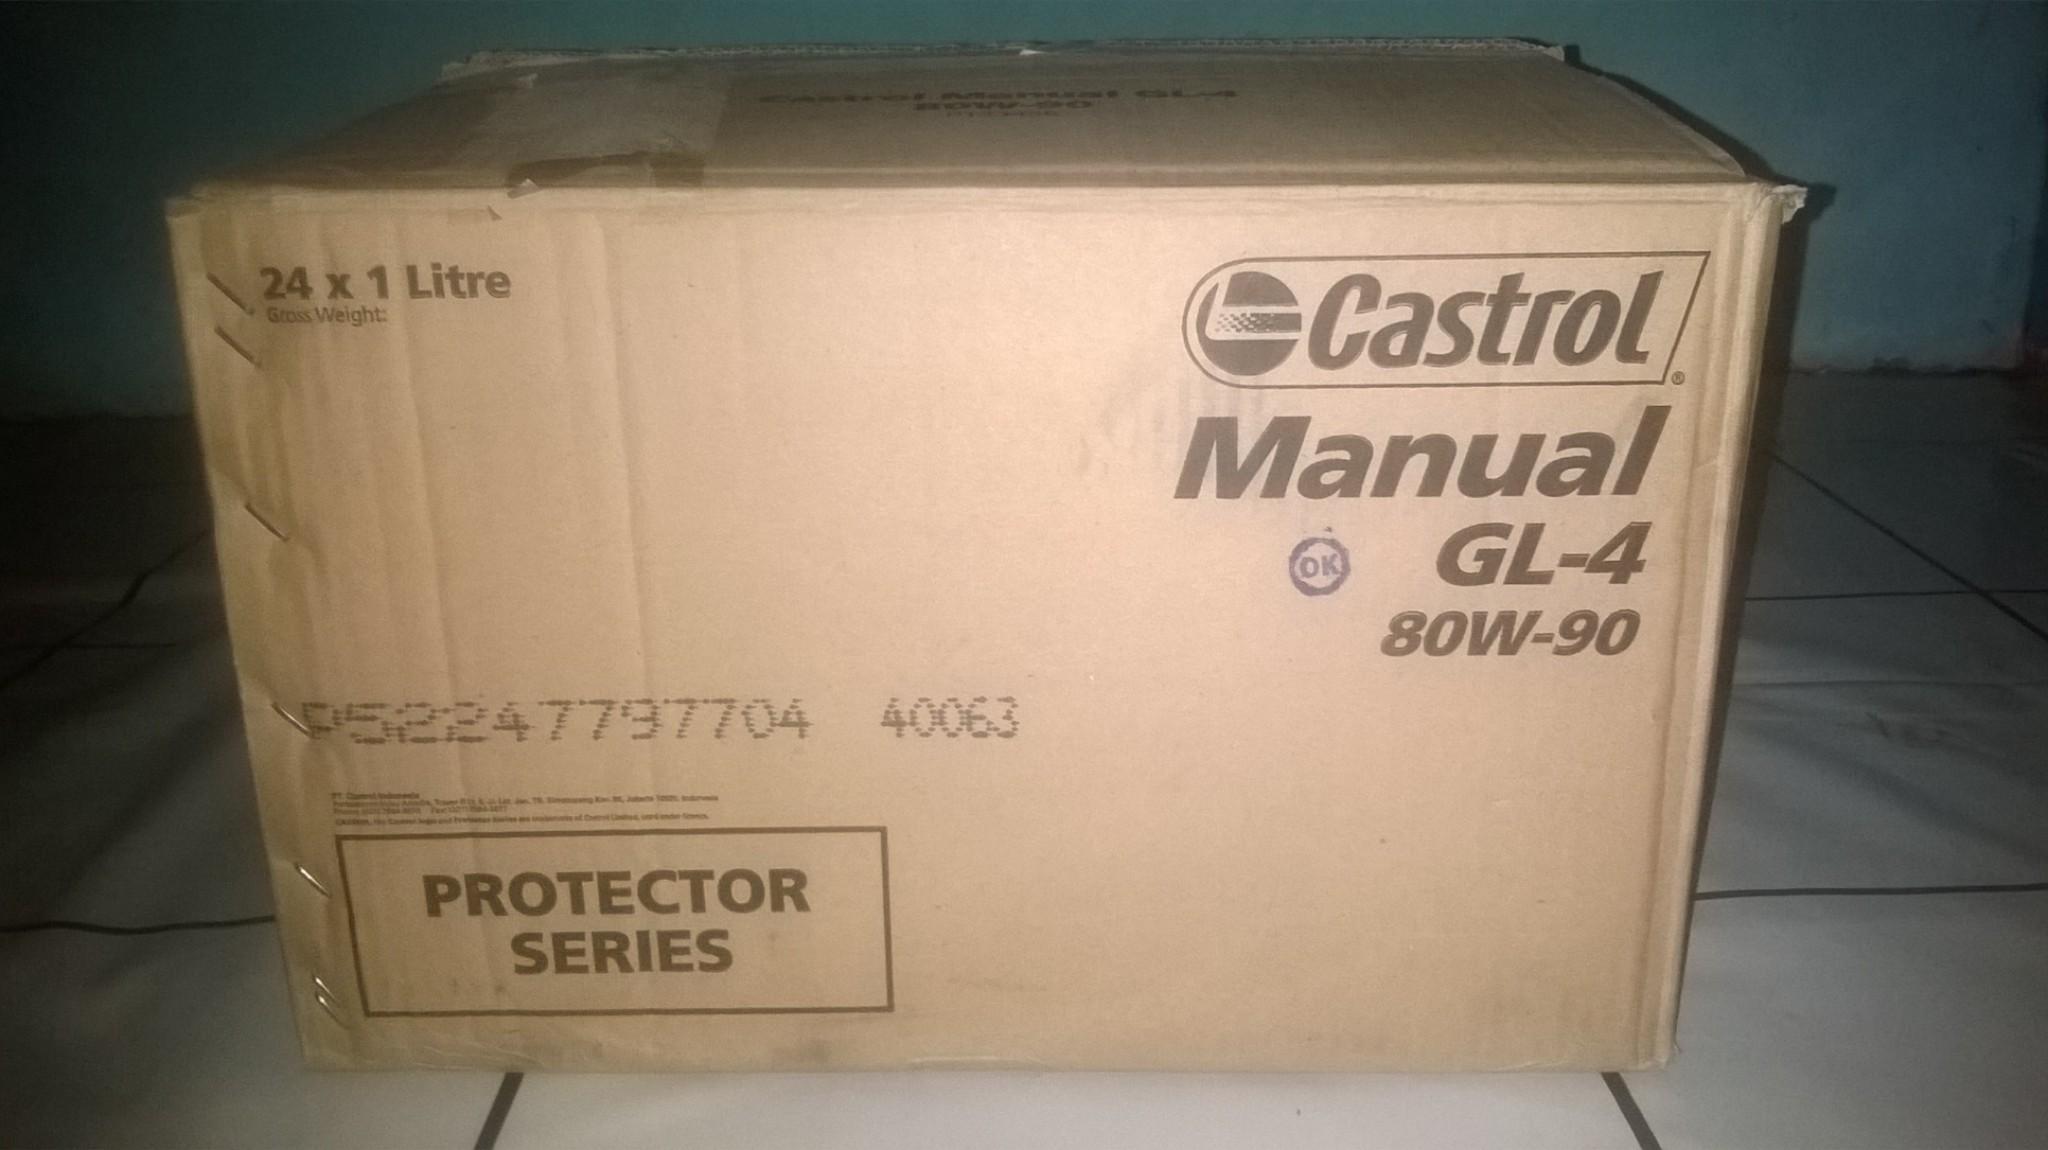 Castrol Manual EP transmissieolie 80W-90, 500ml kopen ...